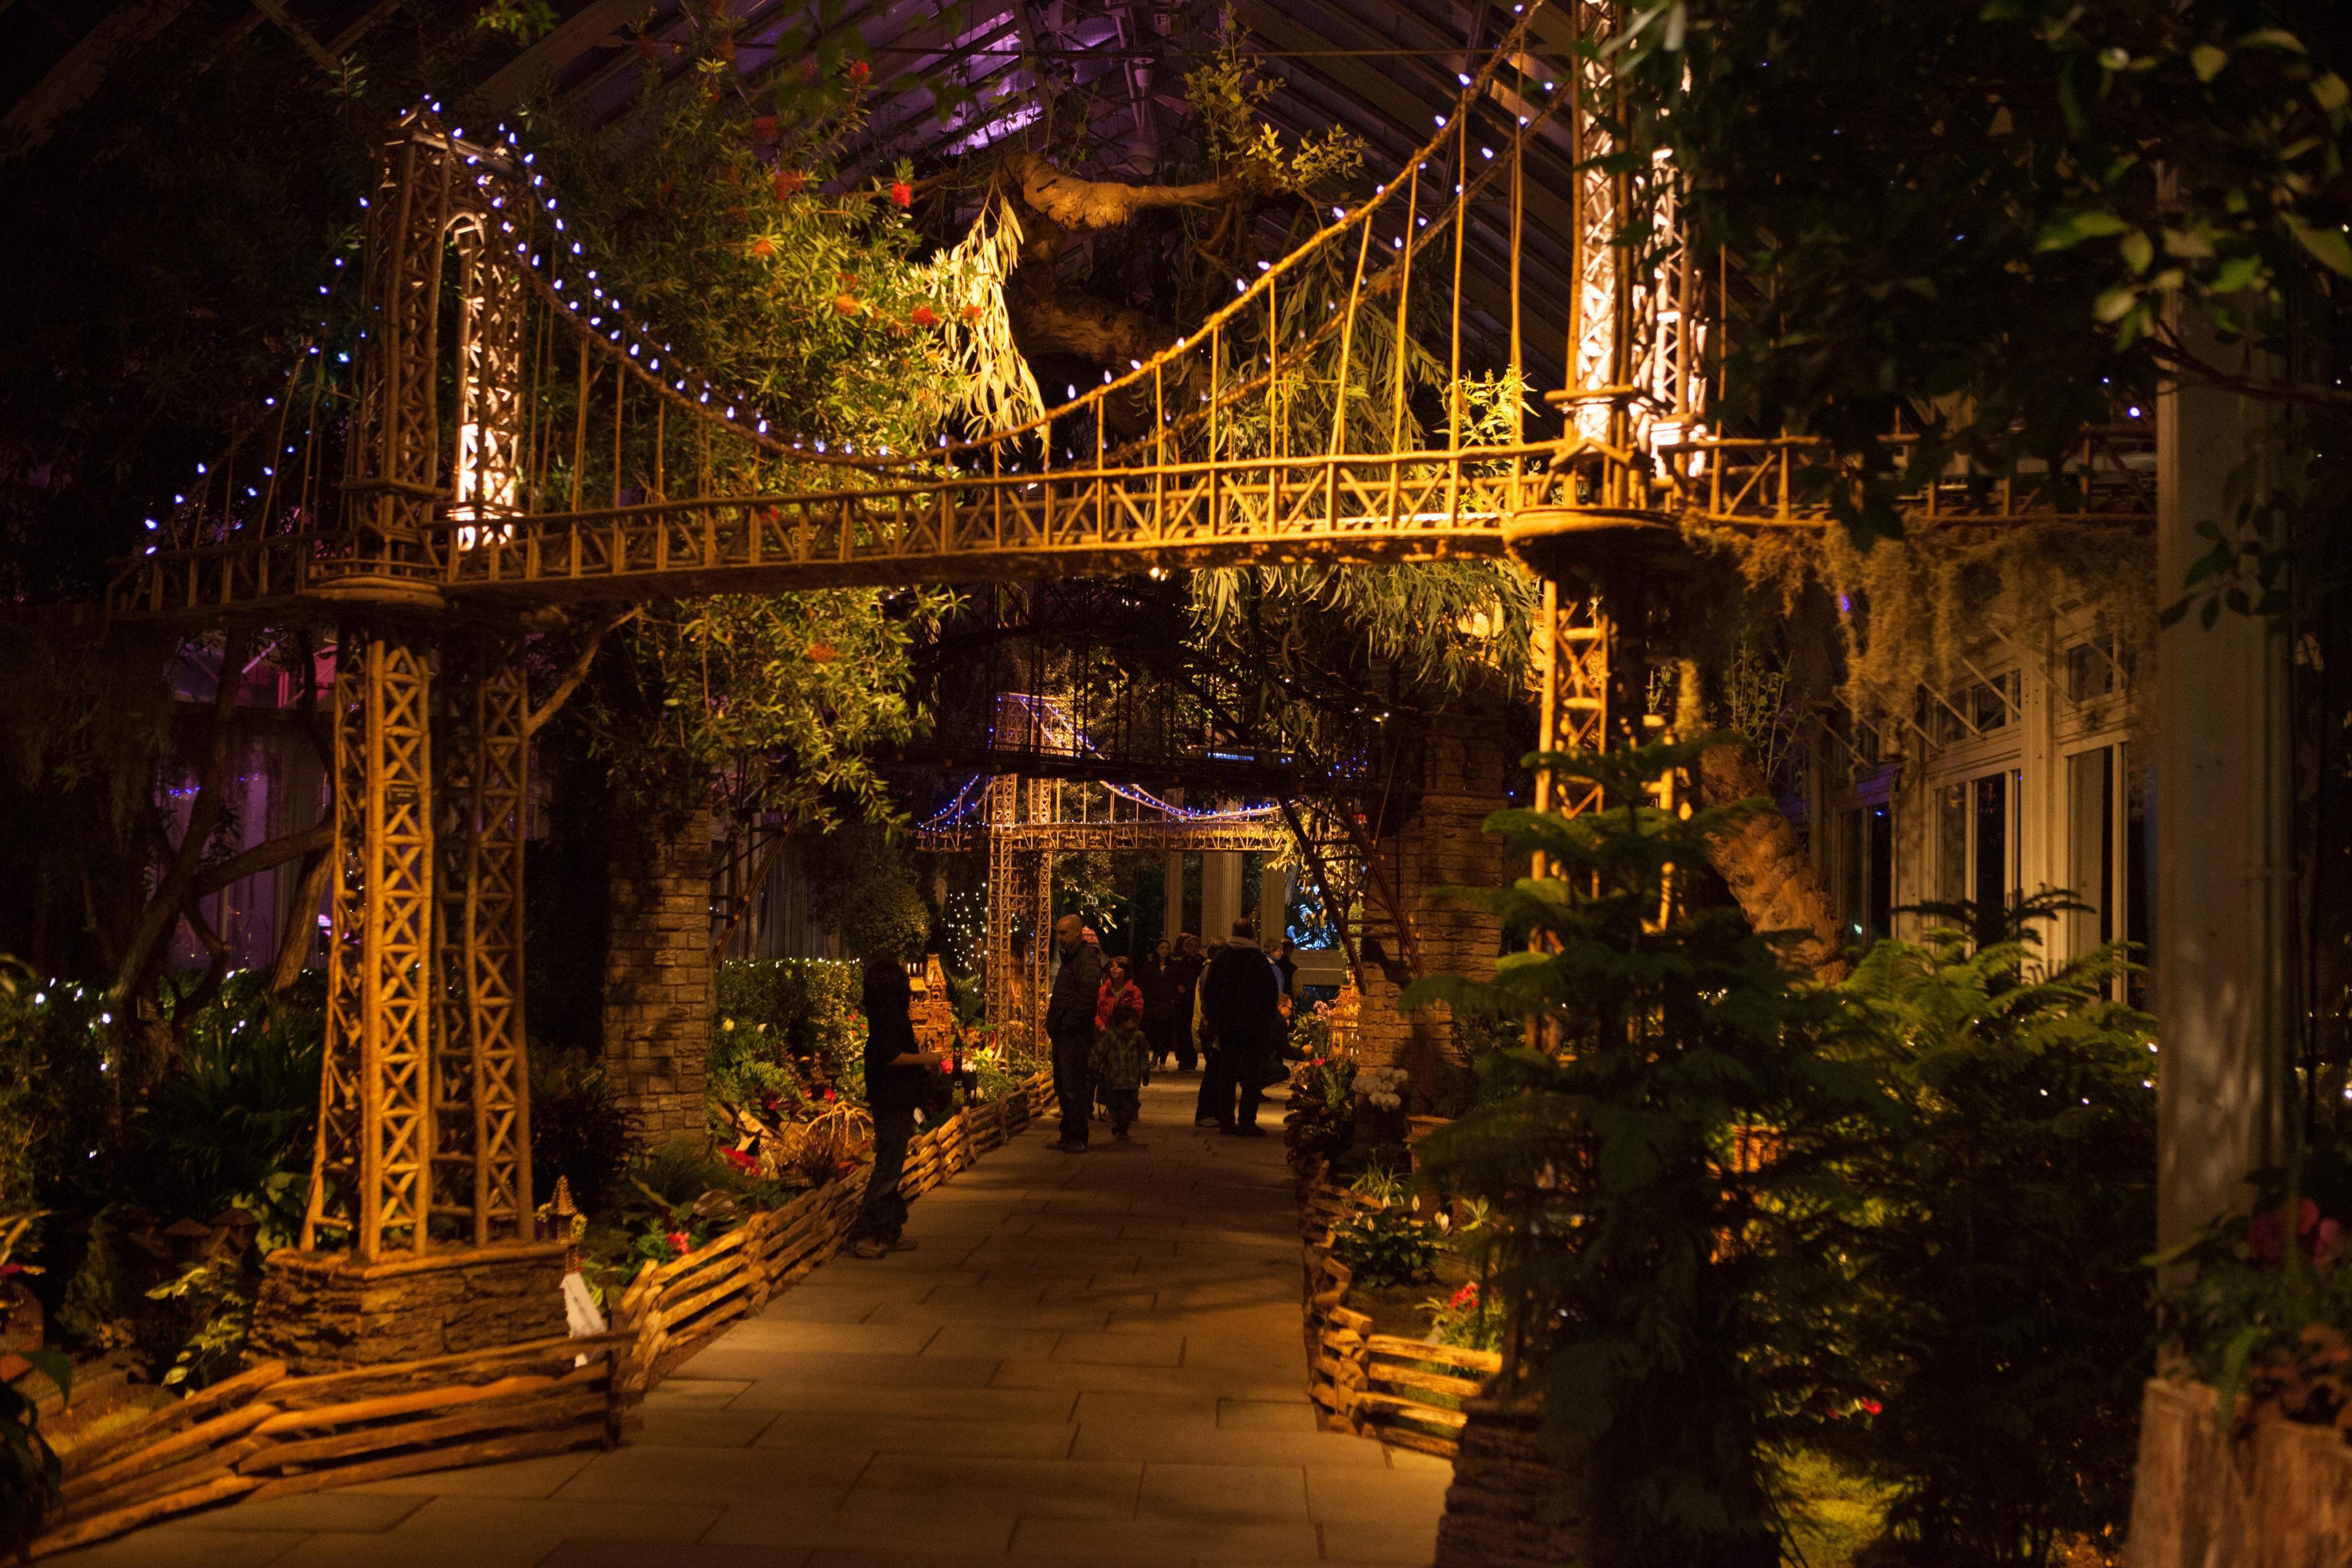 New York Botanical Garden Bronx Ny 10458 New York Path Through